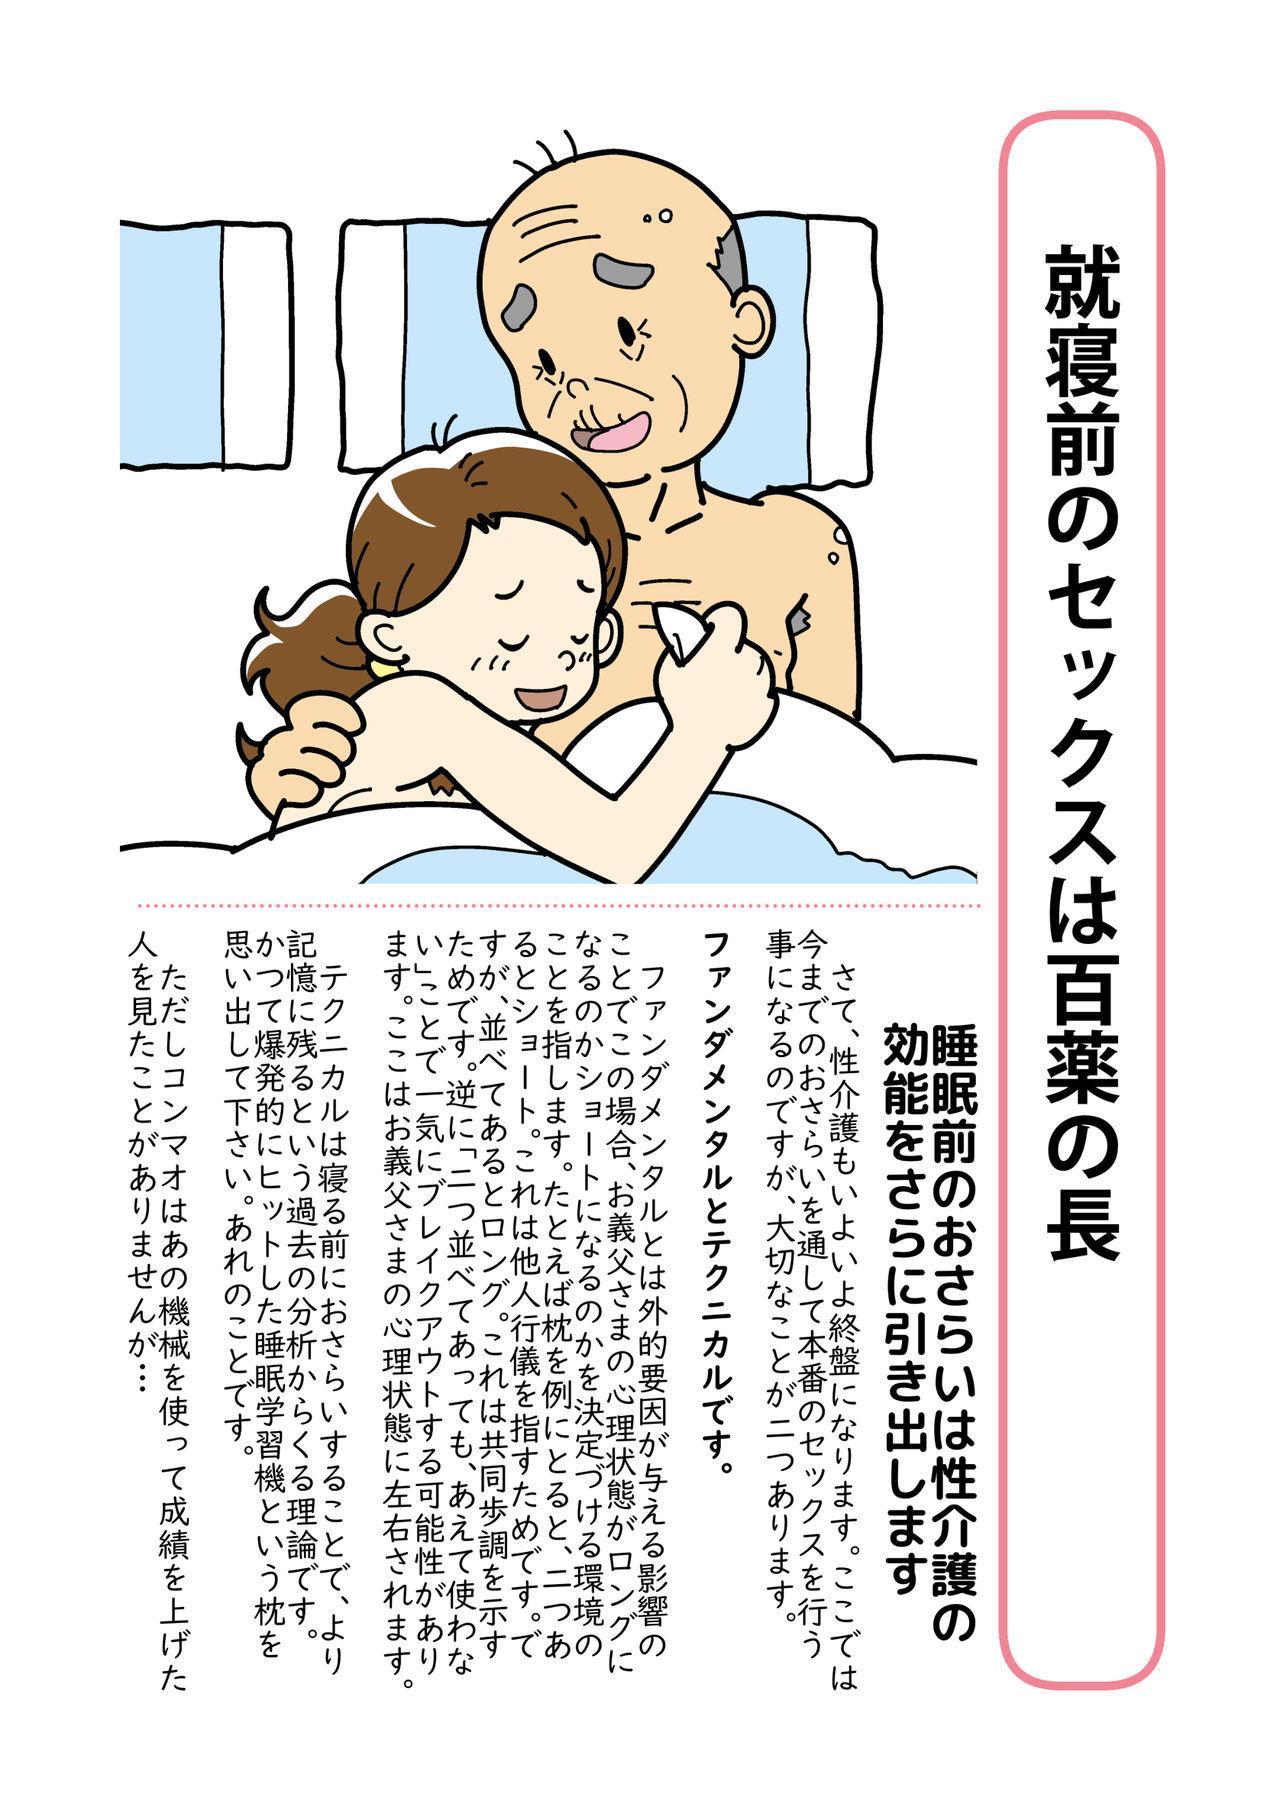 Isogasii Okaasan No Tamuno Sasa Rouzin Seikaigo | Guide for Elderly Sex Health Care to Busy Mom 55